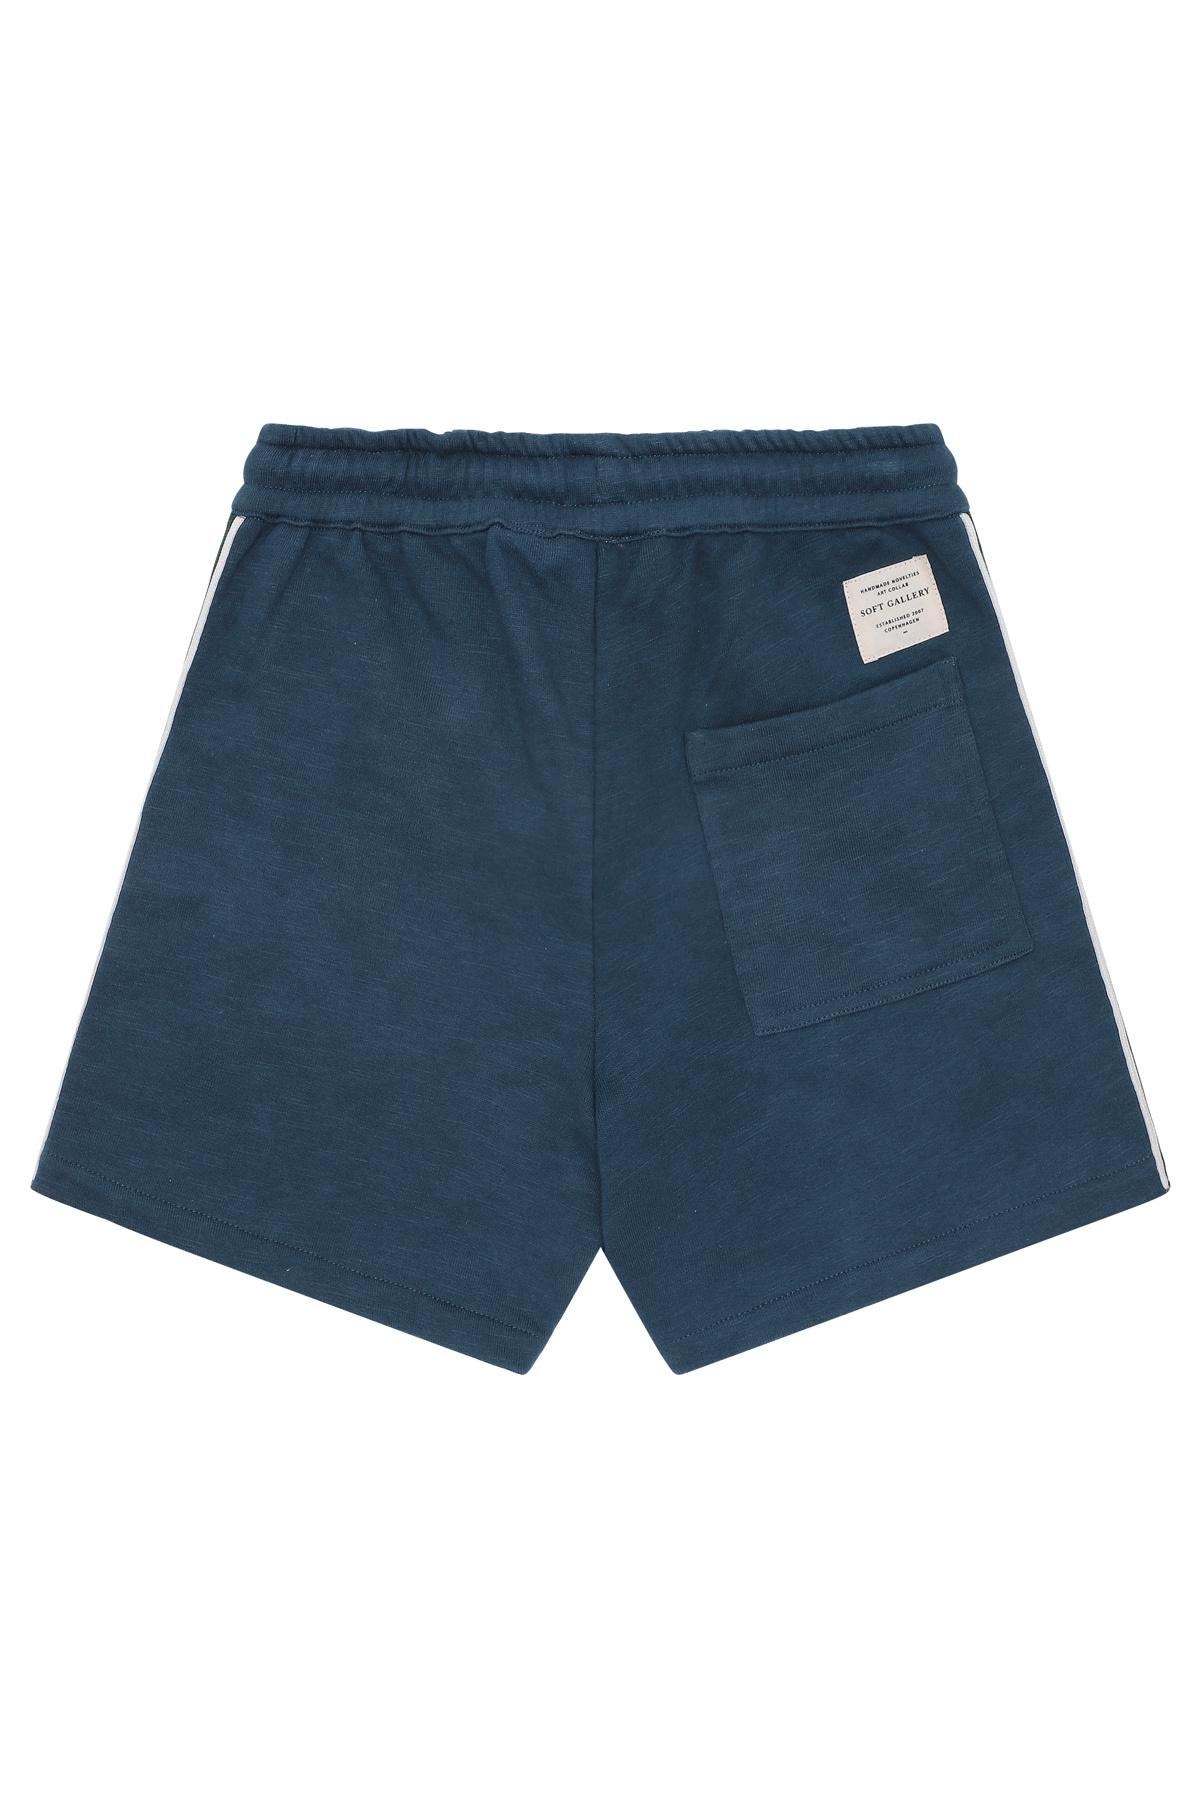 Hudson shorts - Majolica Blue-2